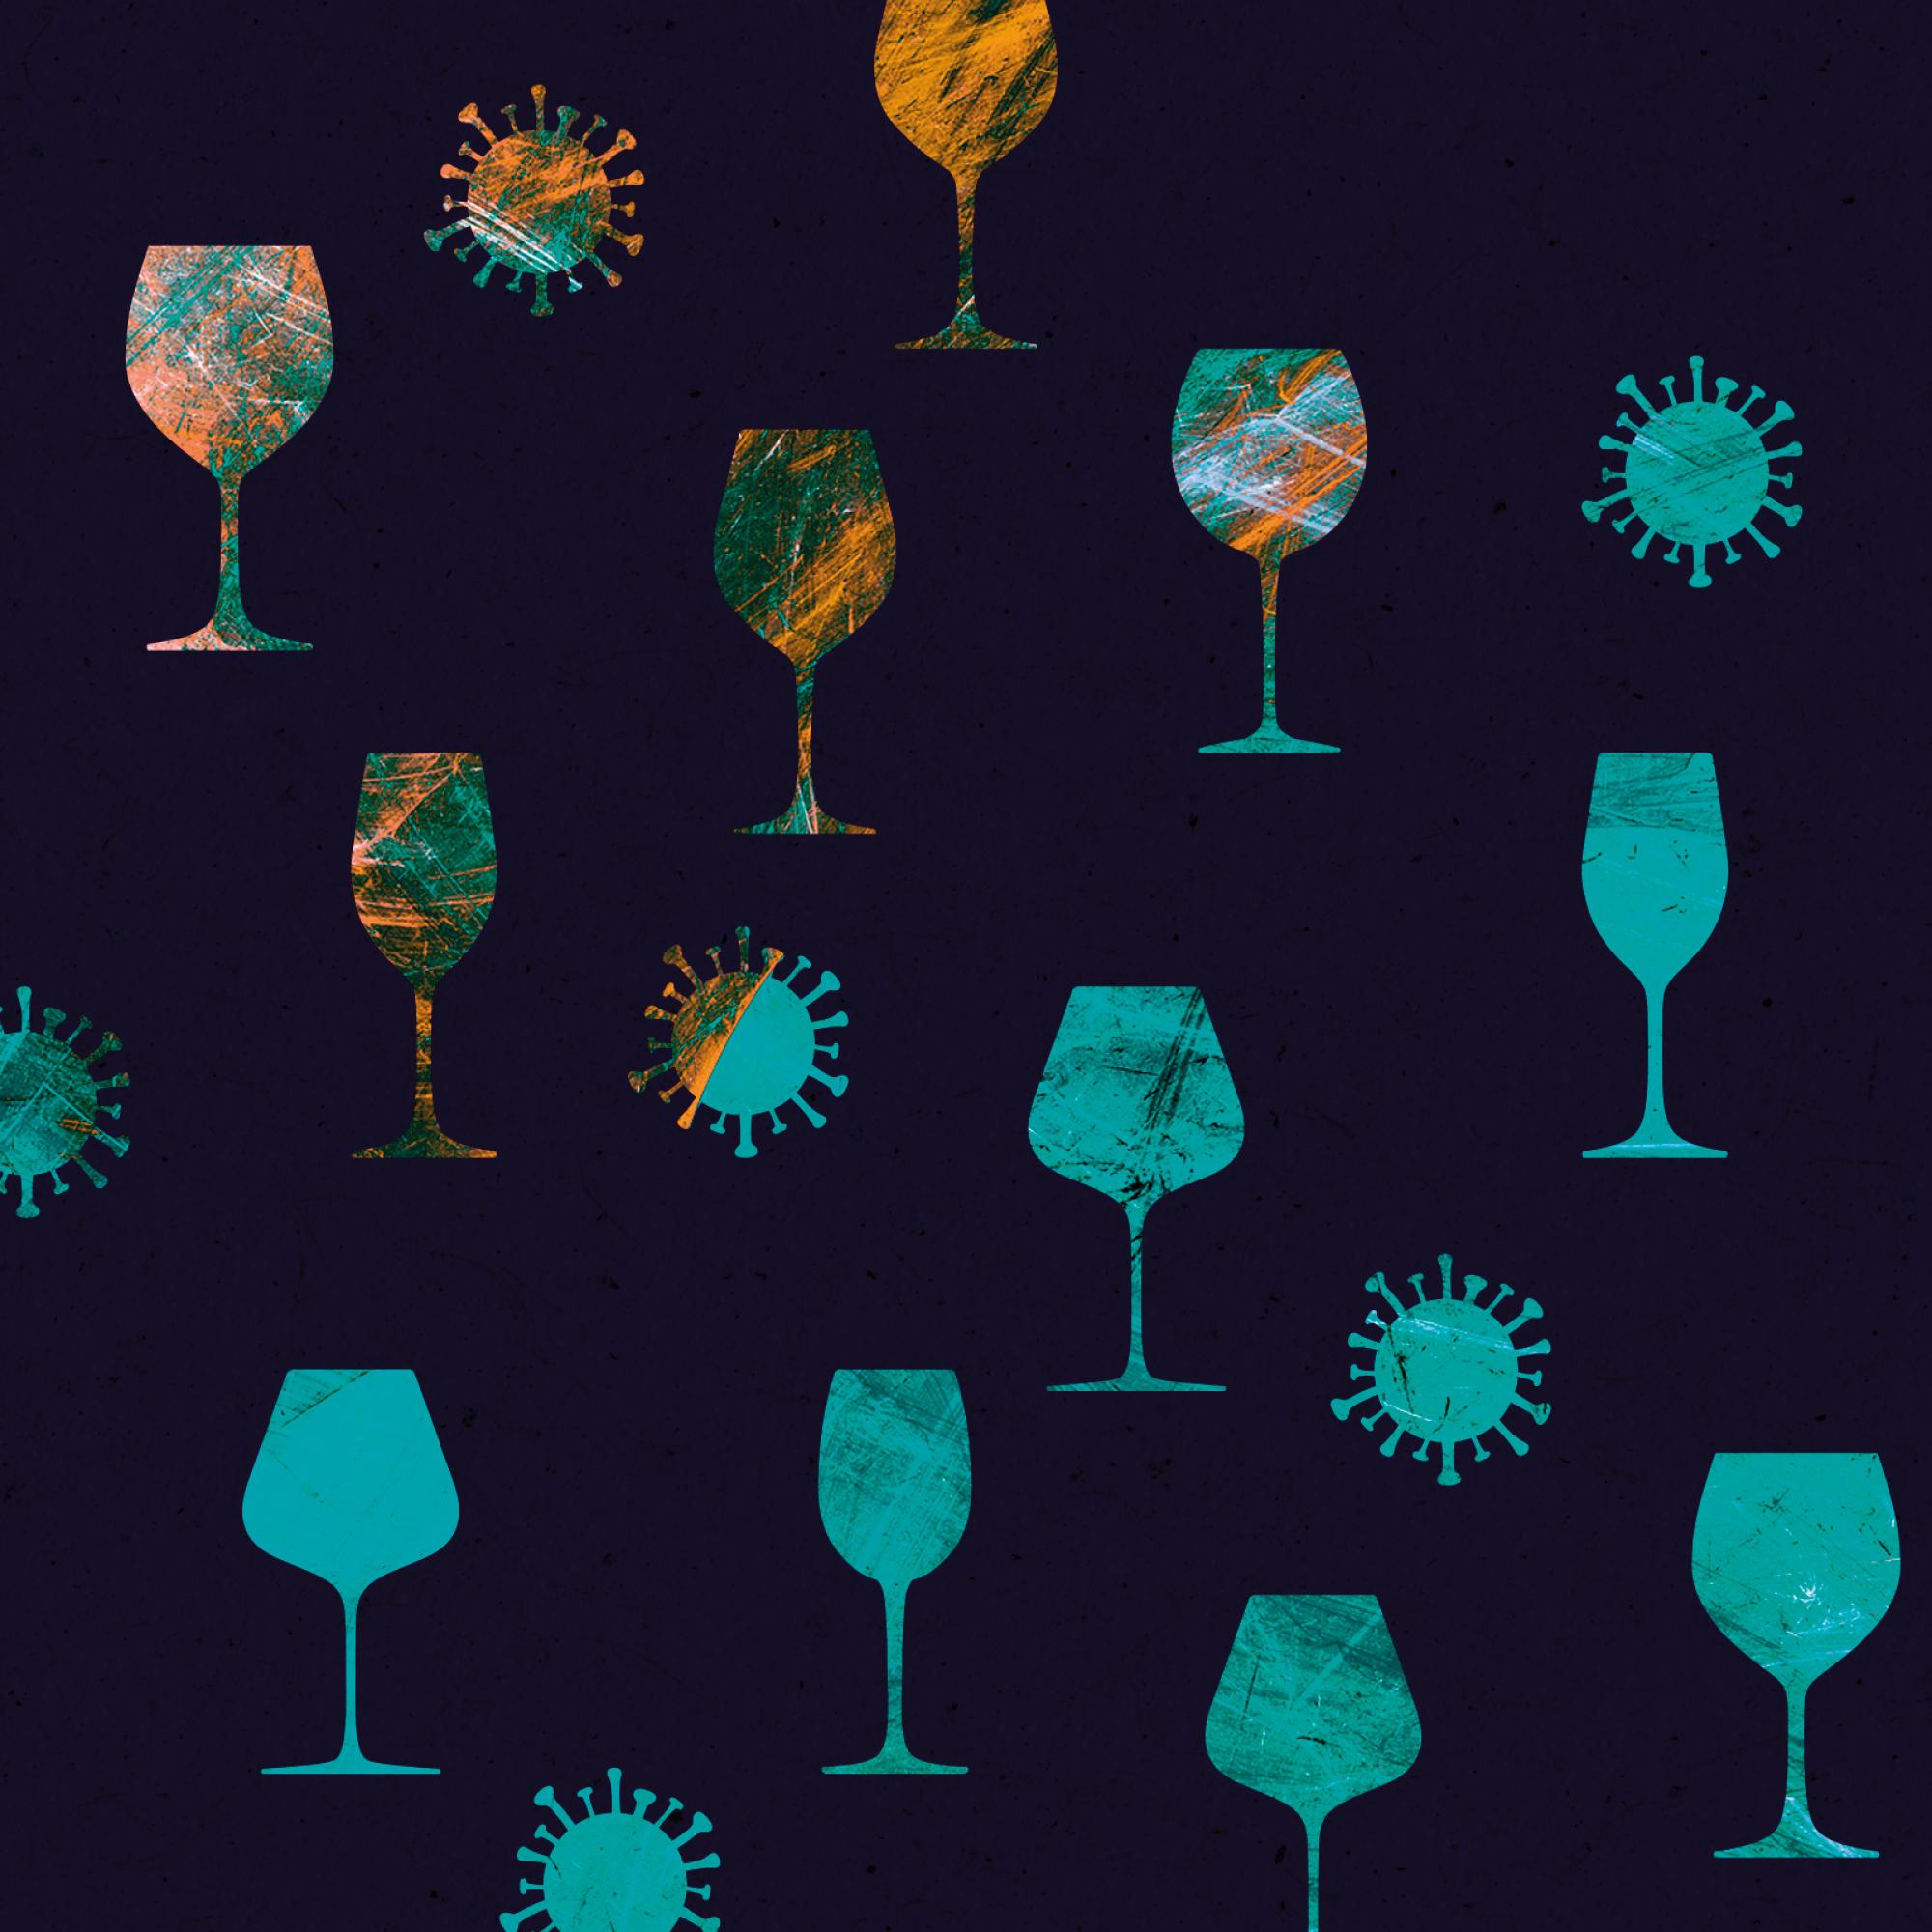 illustration of wine glasses